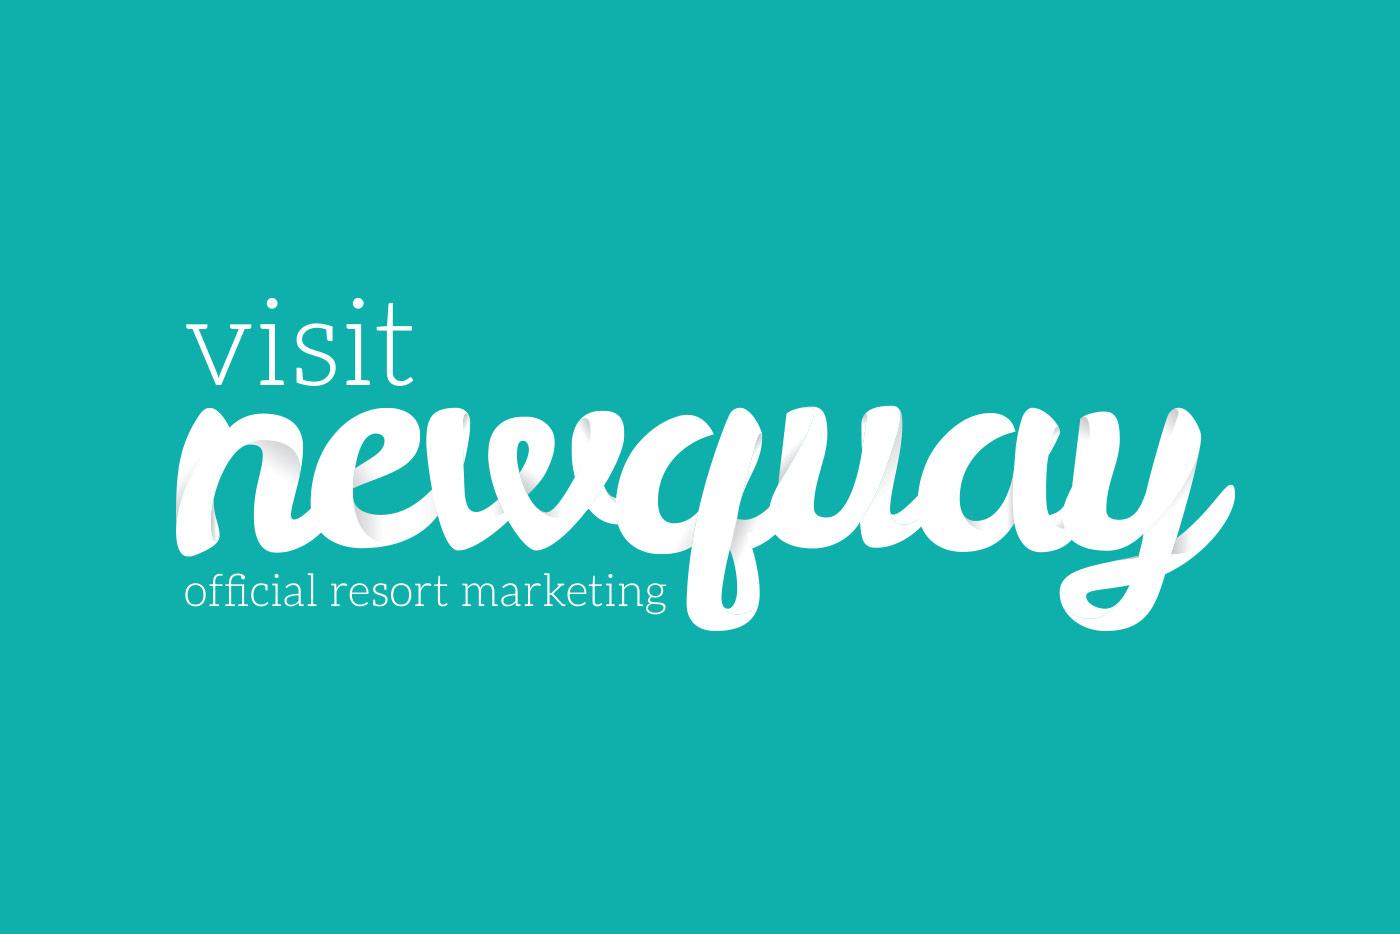 Visit Newquay branding